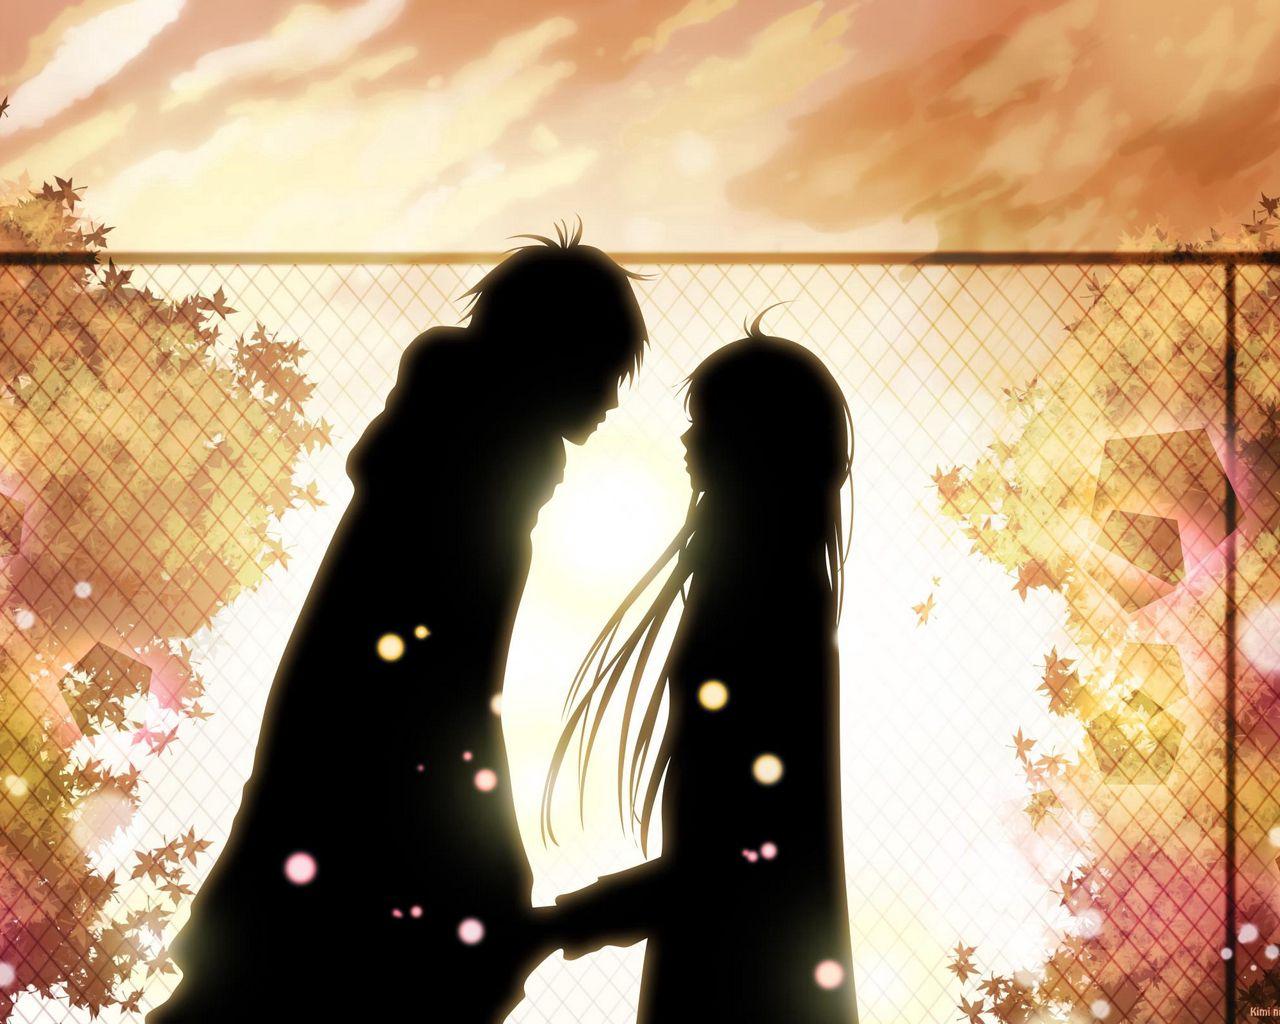 1280x1024 Wallpaper kimi ni todoke, girl, boy, love, feelings, meet, date, fall, leaves